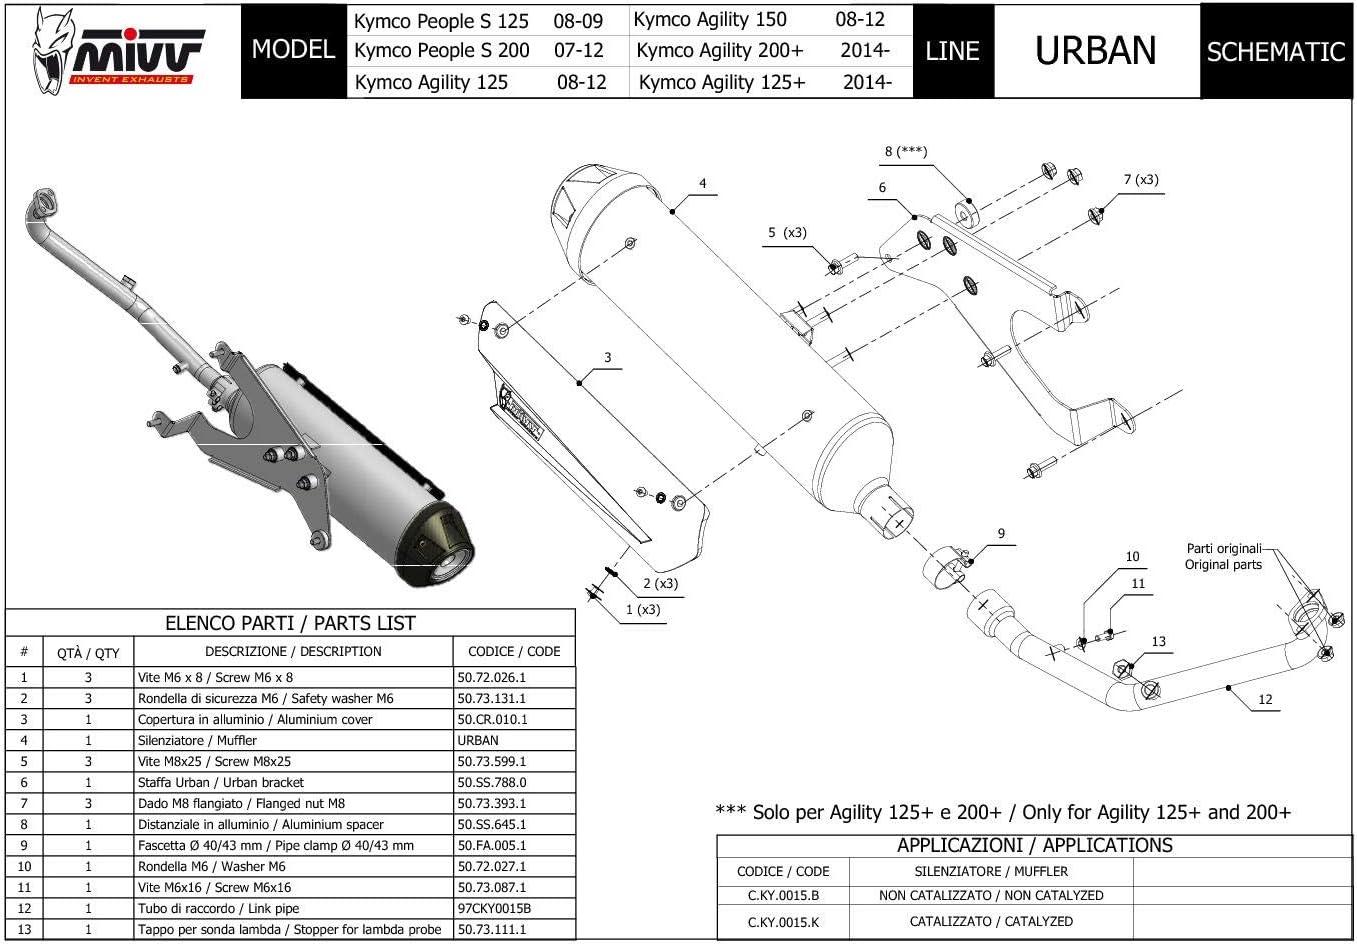 New C.KY.0015.K Pot D Echappament Complet Cat MIVV Urban Inox pour People S 200 2009 09